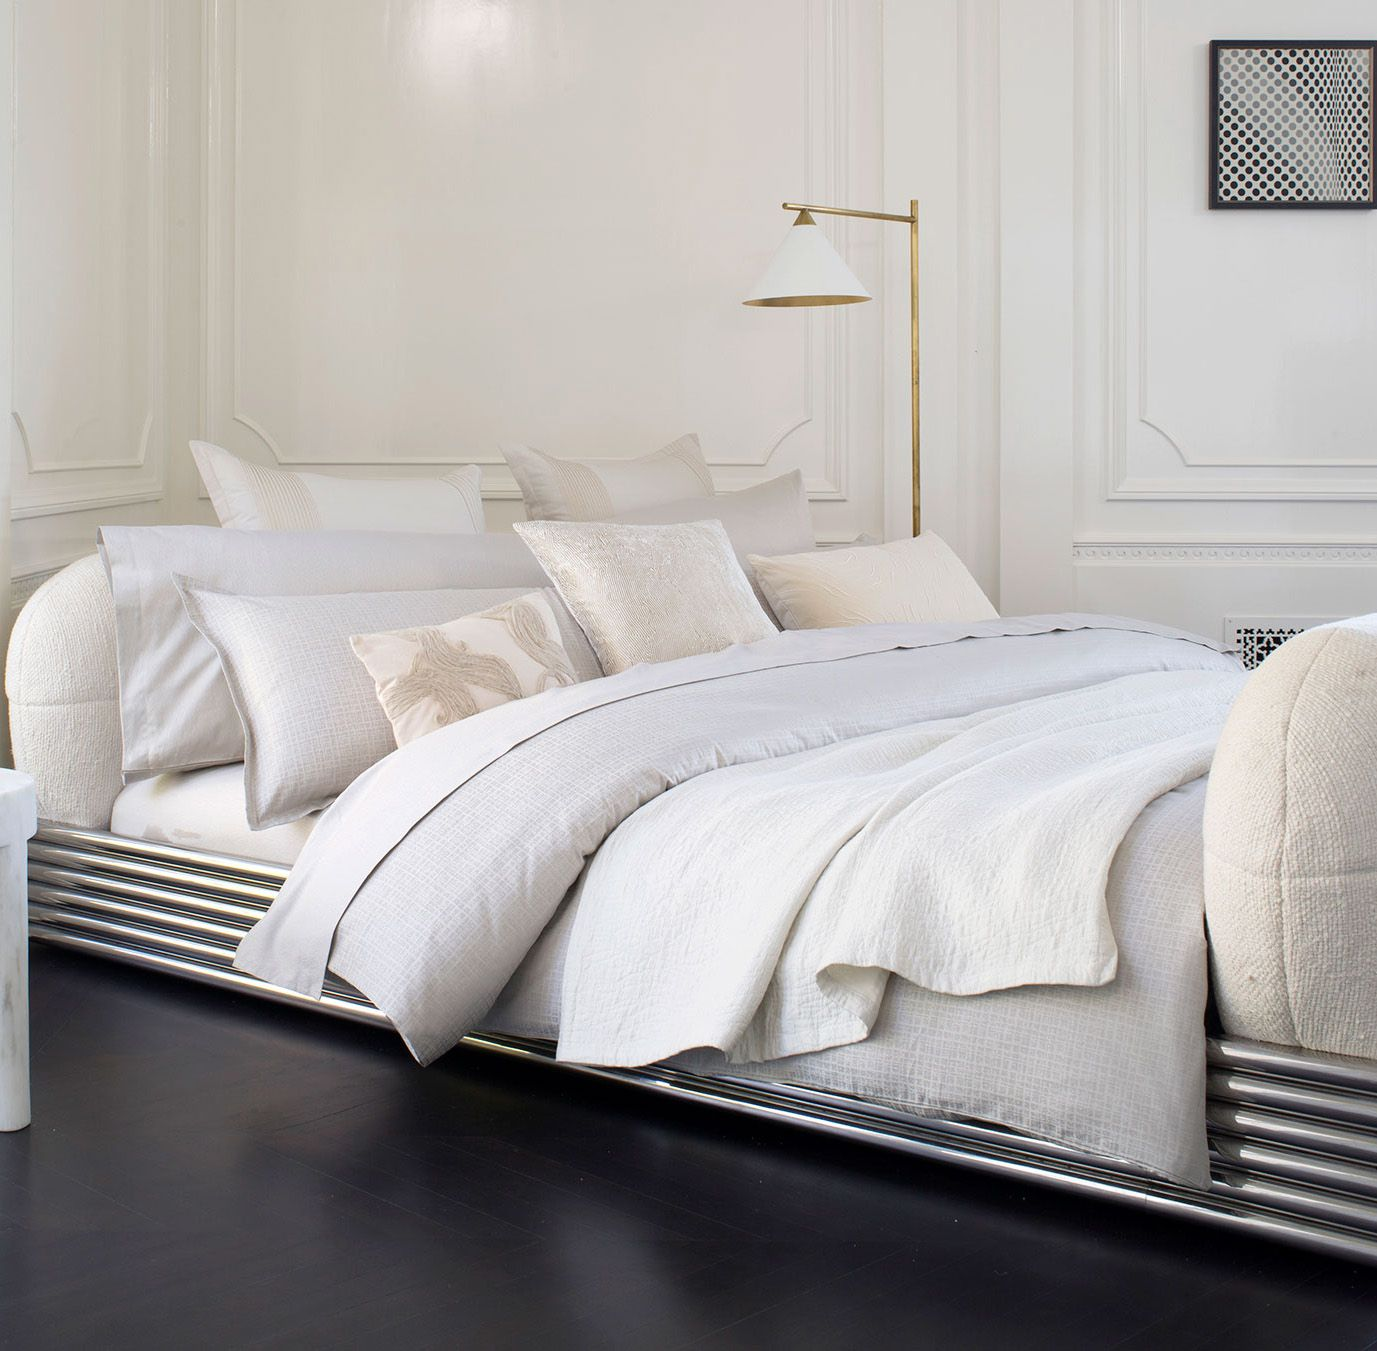 19 Lavish Bedroom Designs That You Shouldn T Miss: DUNE BEDDING. Elegant Bedroom Essentials